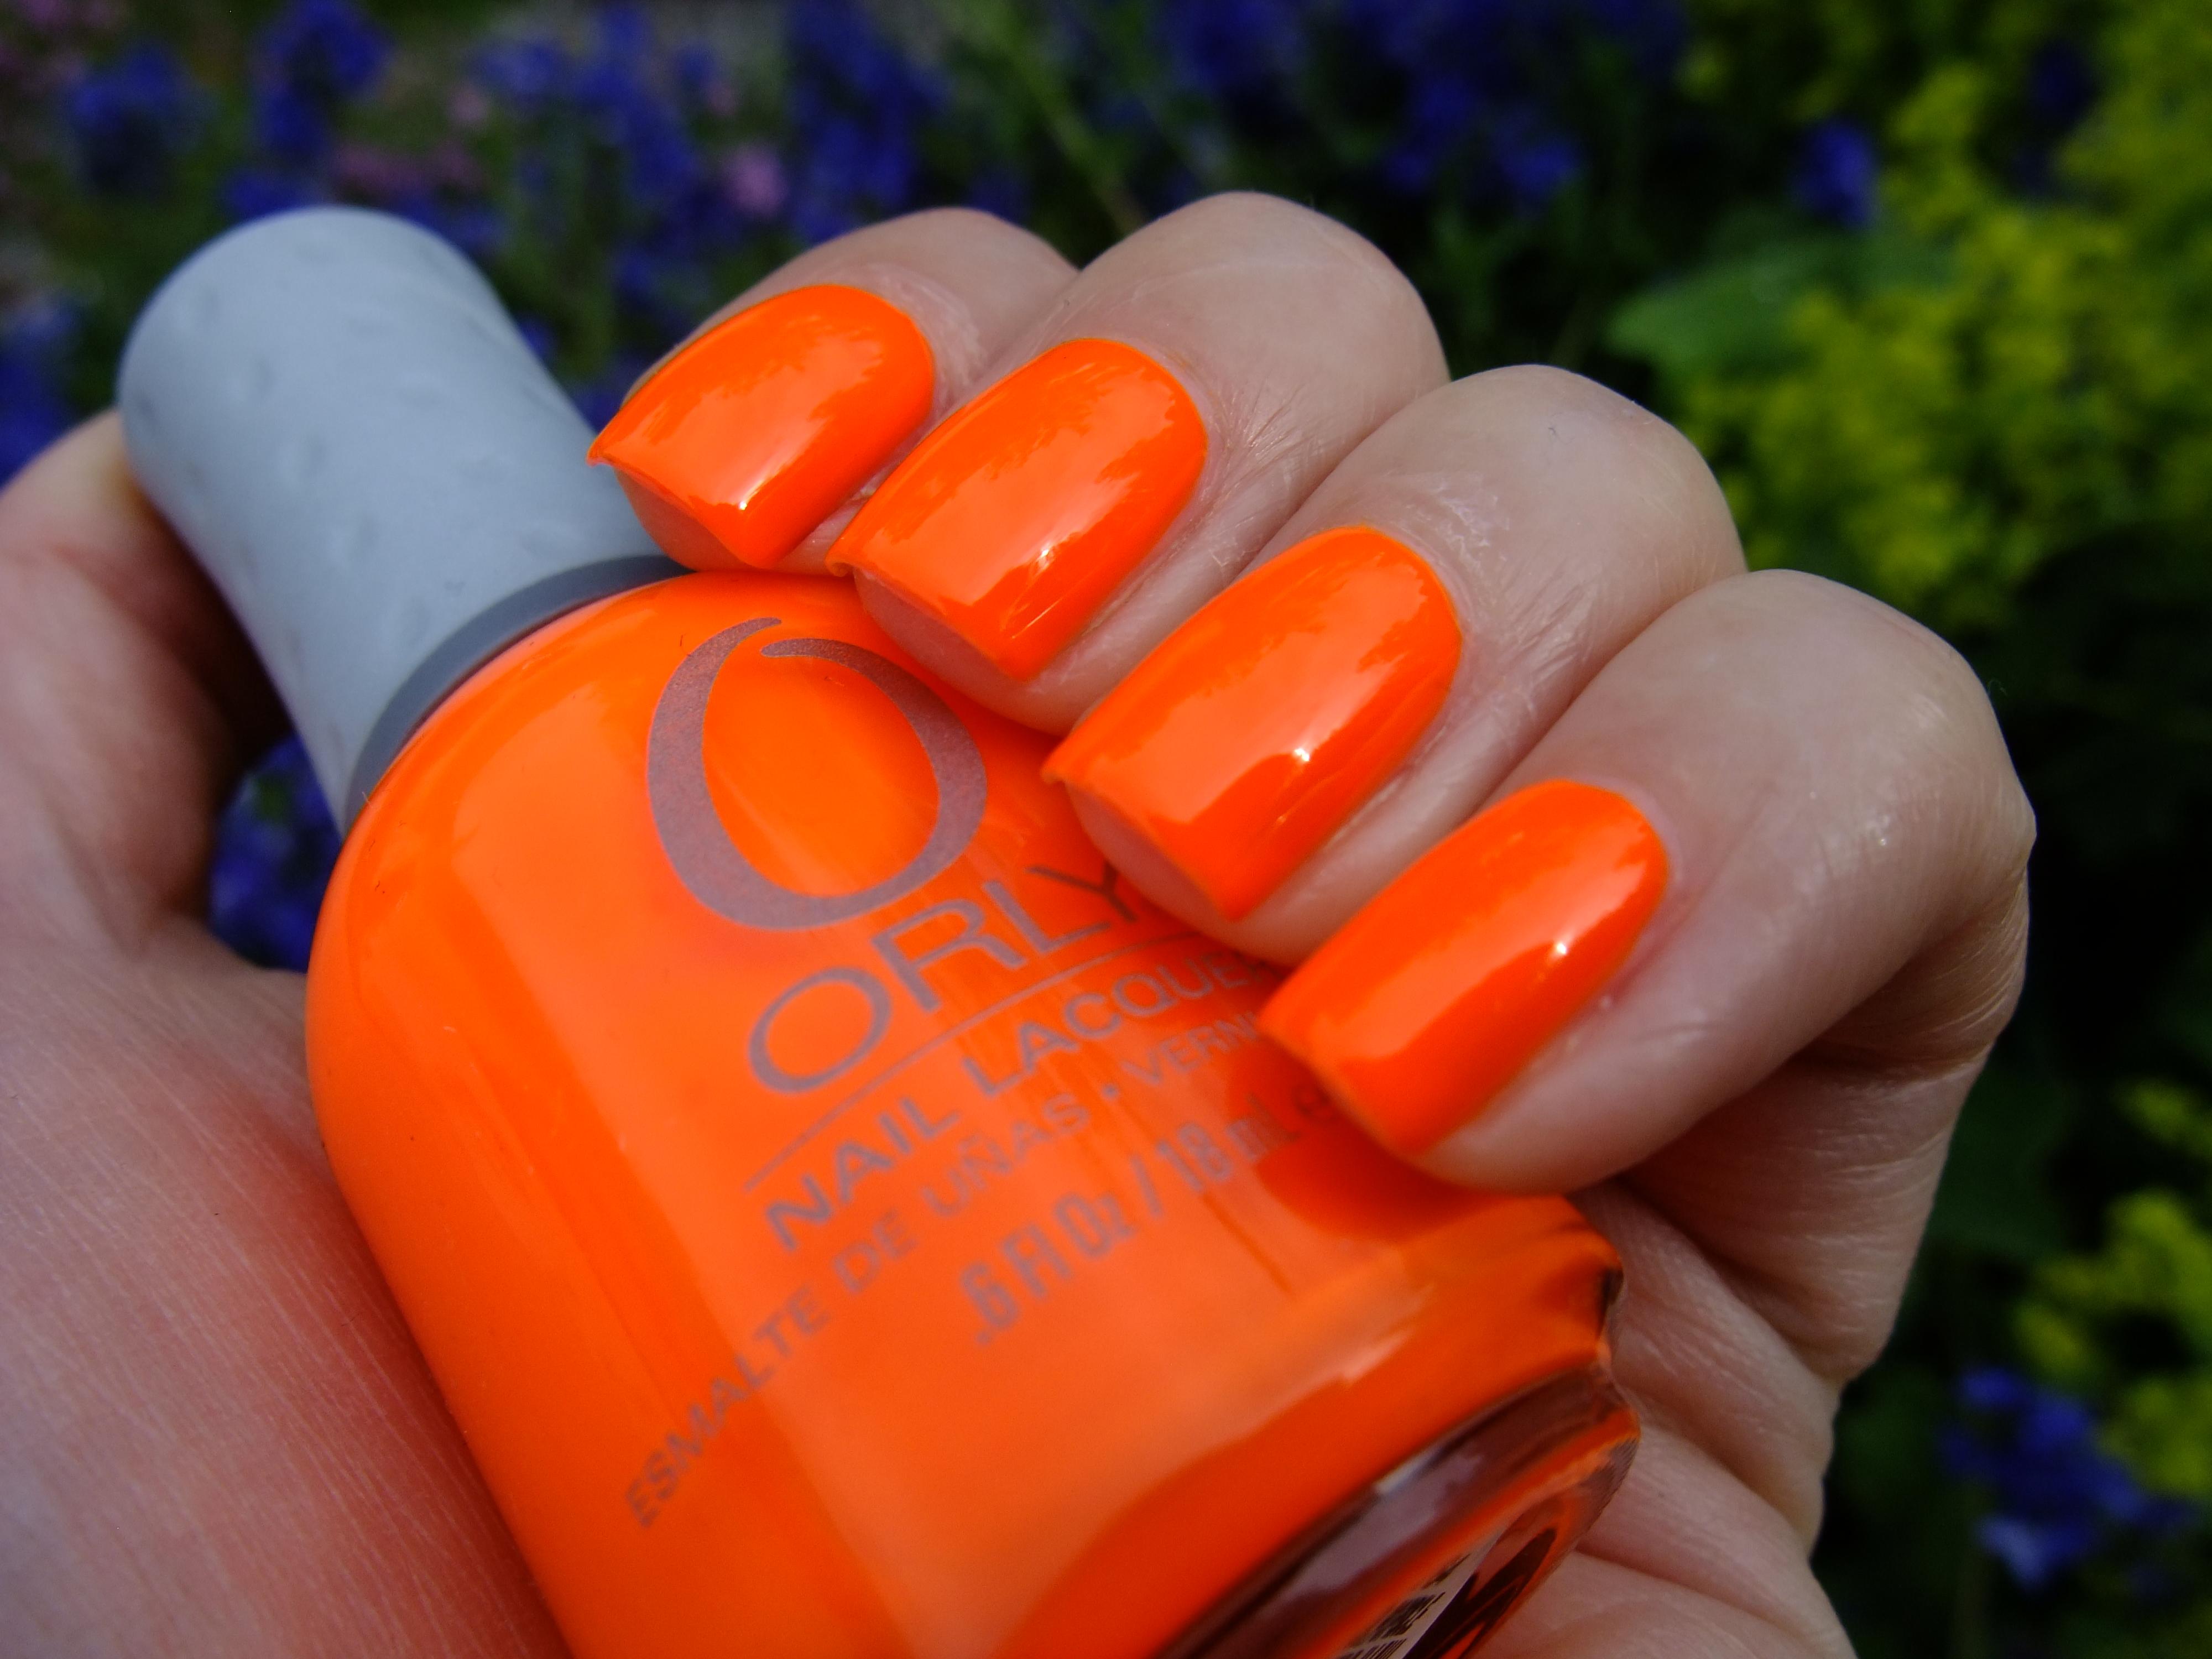 Orly Melt Your Popsicle Crazy Fluro Orange Neon Summer